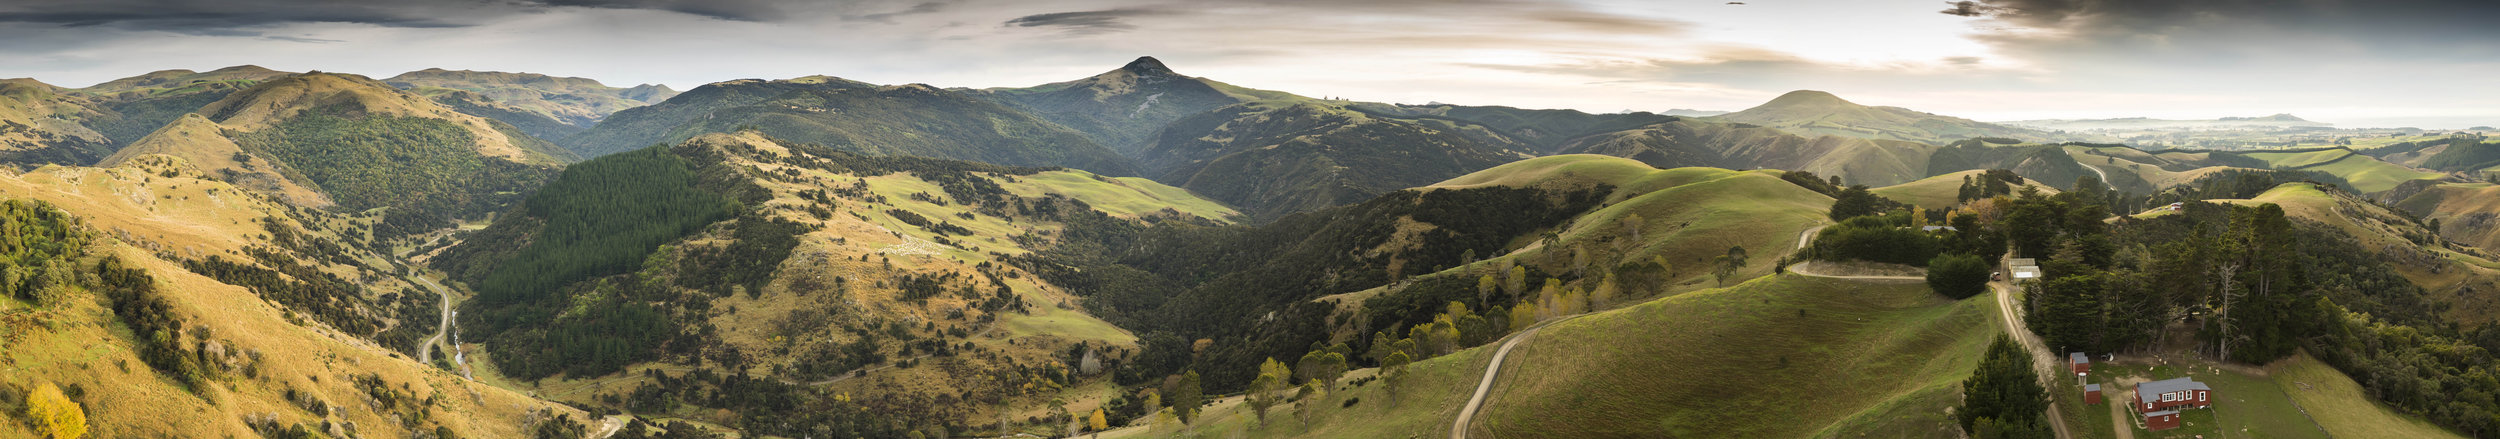 Mt_Watkins_Autumn_180_Panorama.jpg